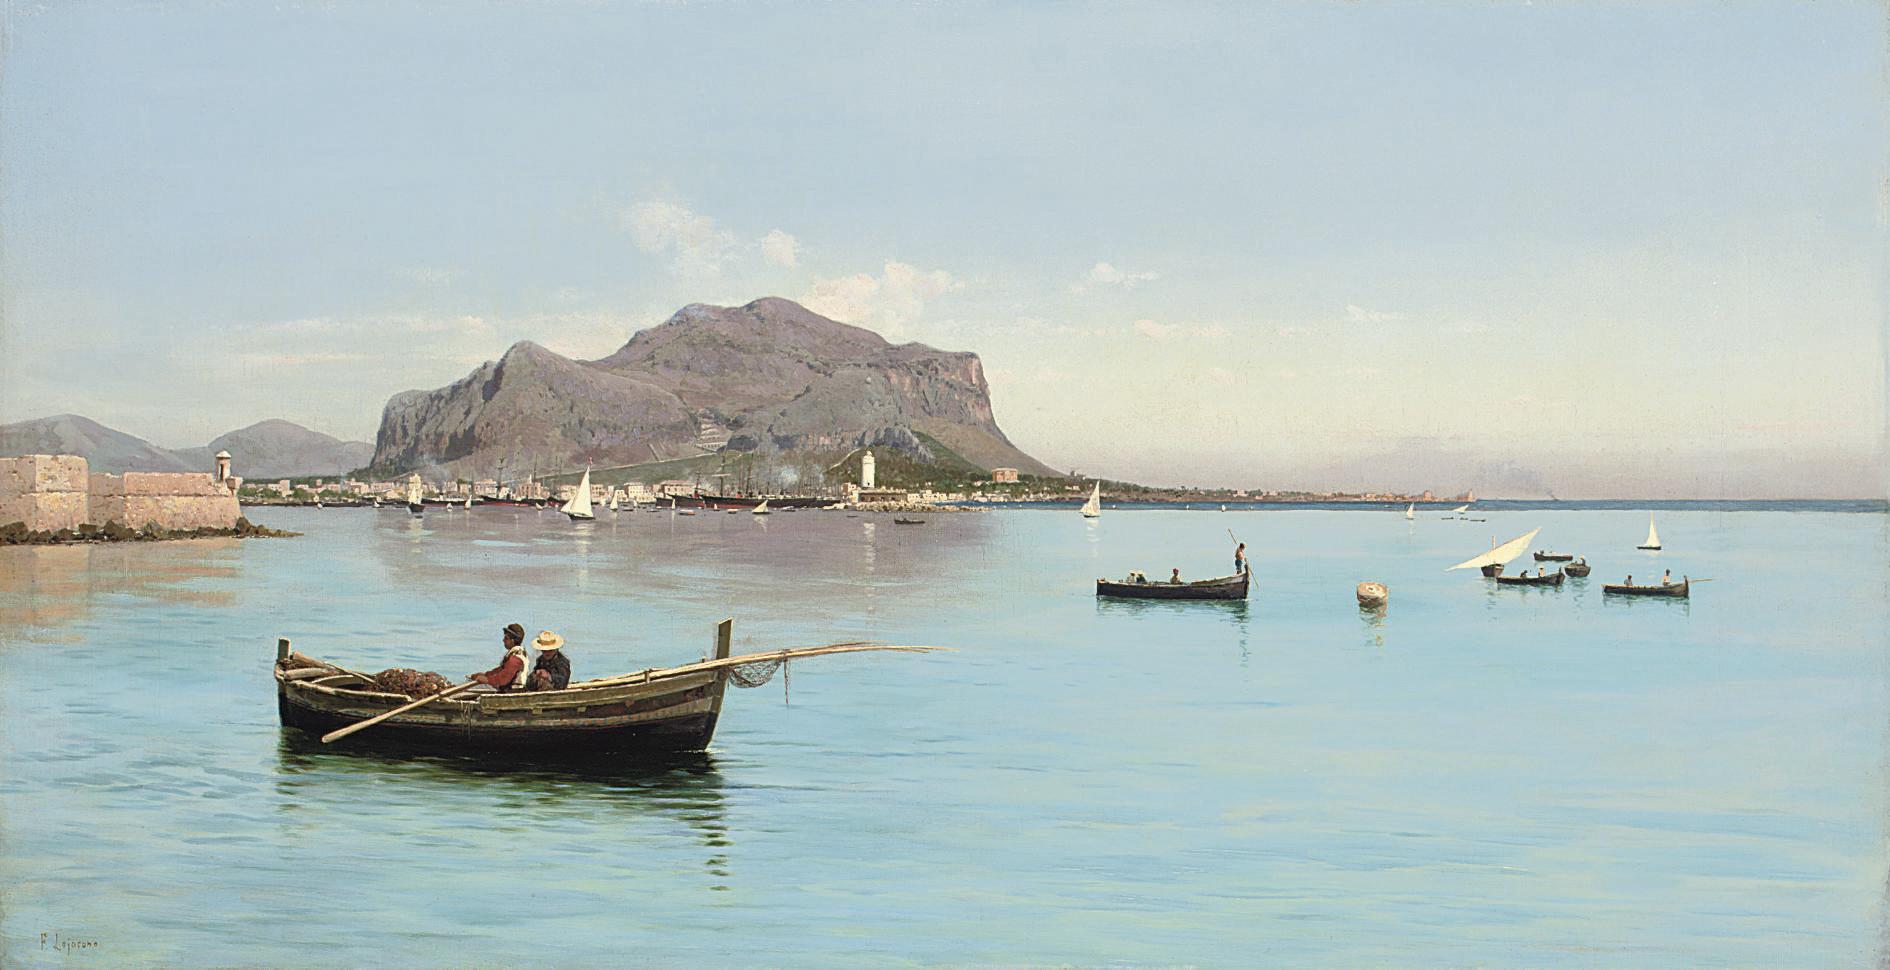 Fishermen before the Monte Pellegrino in Palermo, Sicily